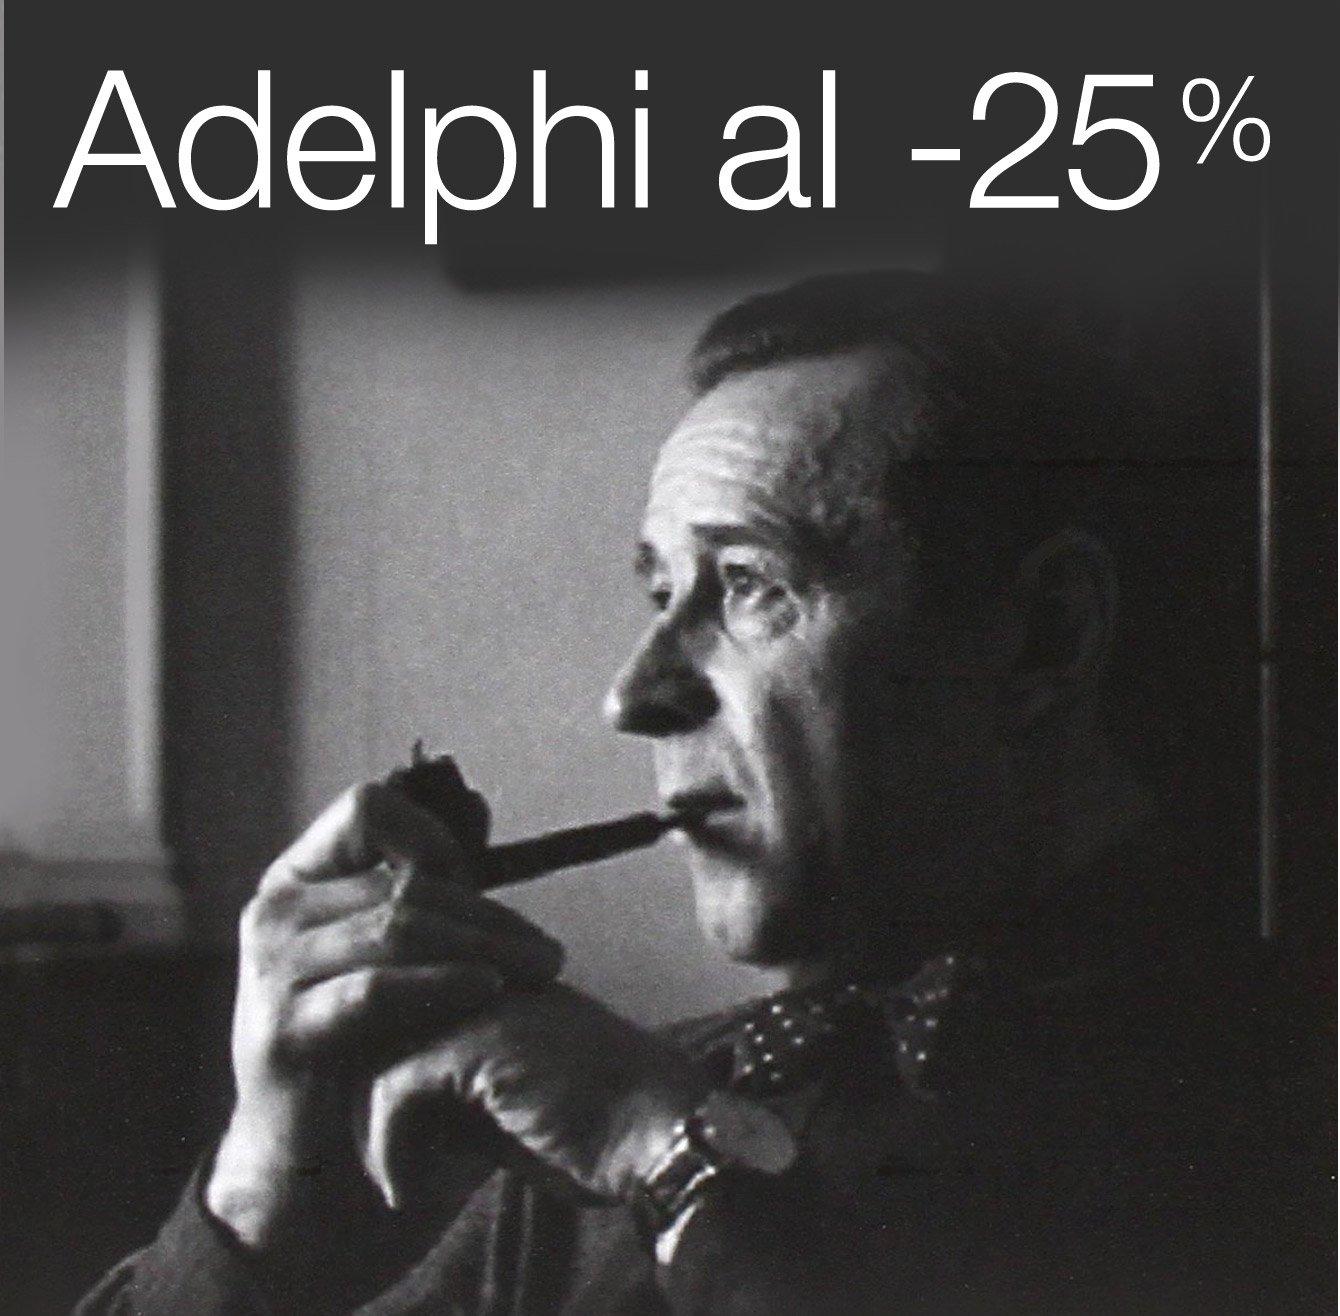 Adelphi al -25%